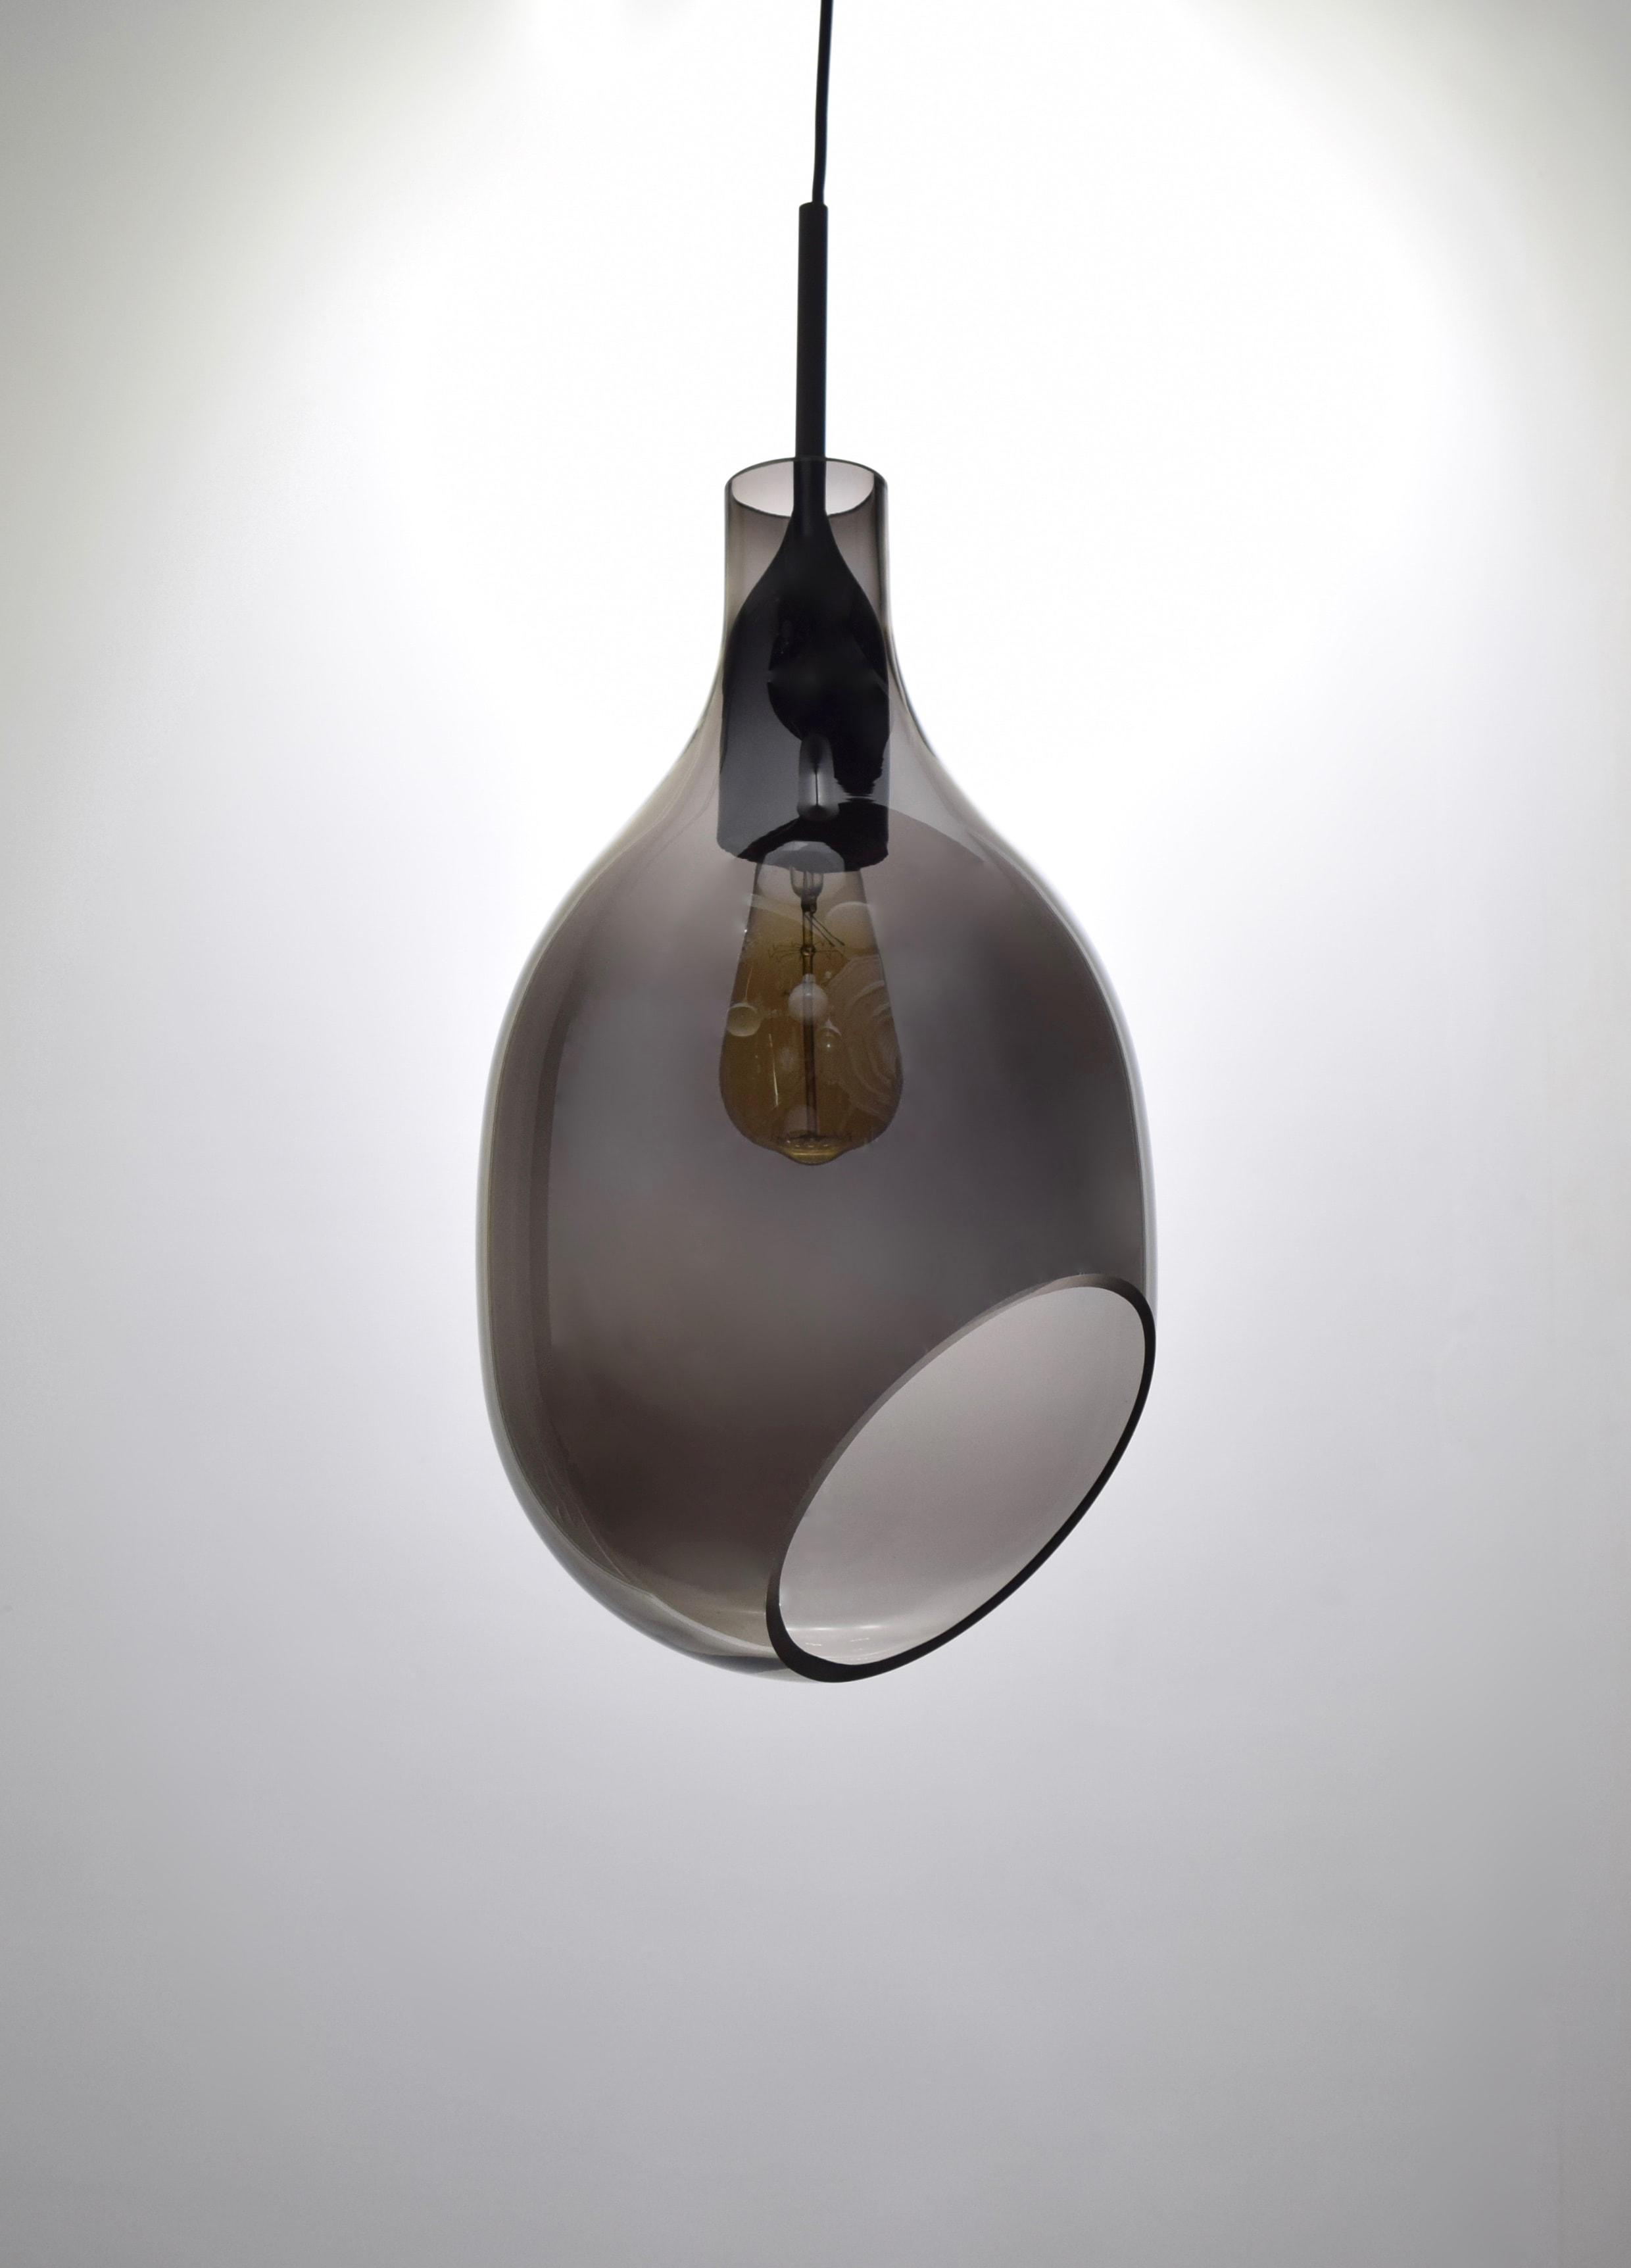 VESSEL 斜口玻璃煙灰色吊燈-BNL00127 3